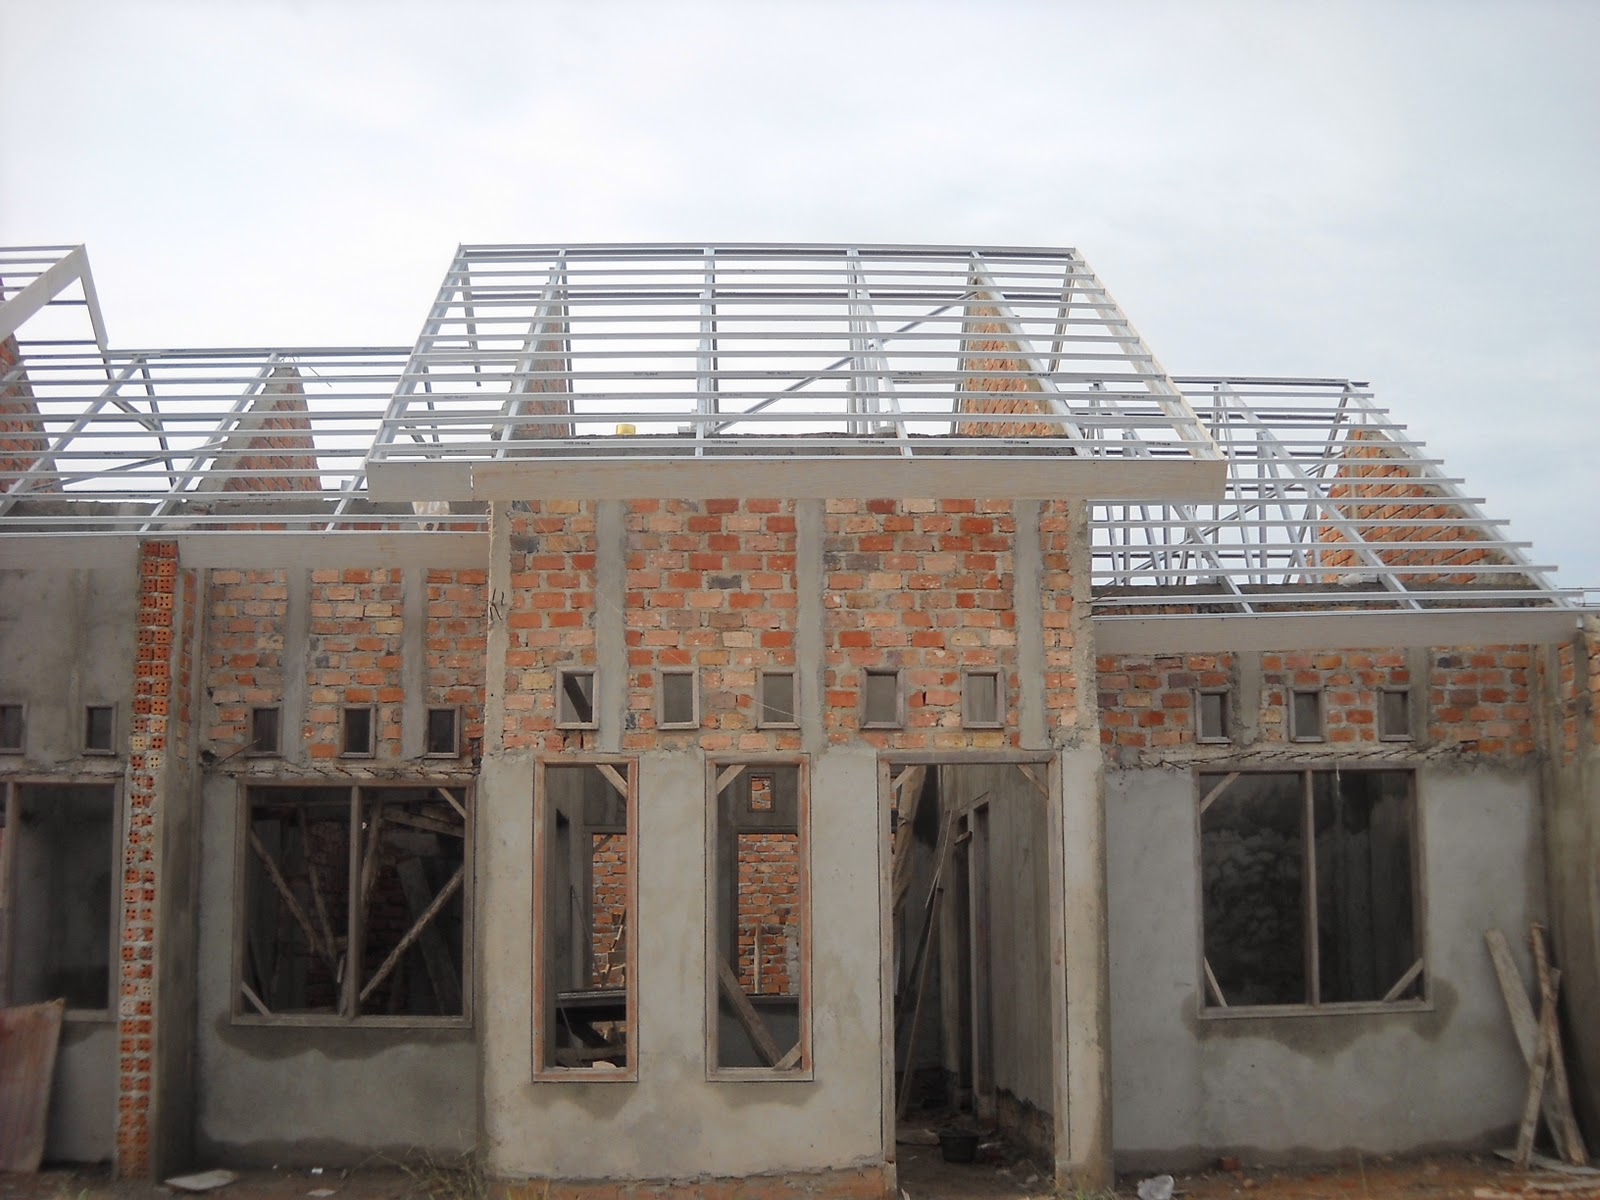 harga pasang atap baja ringan bogor benuatrussbajaringan blogspot co id